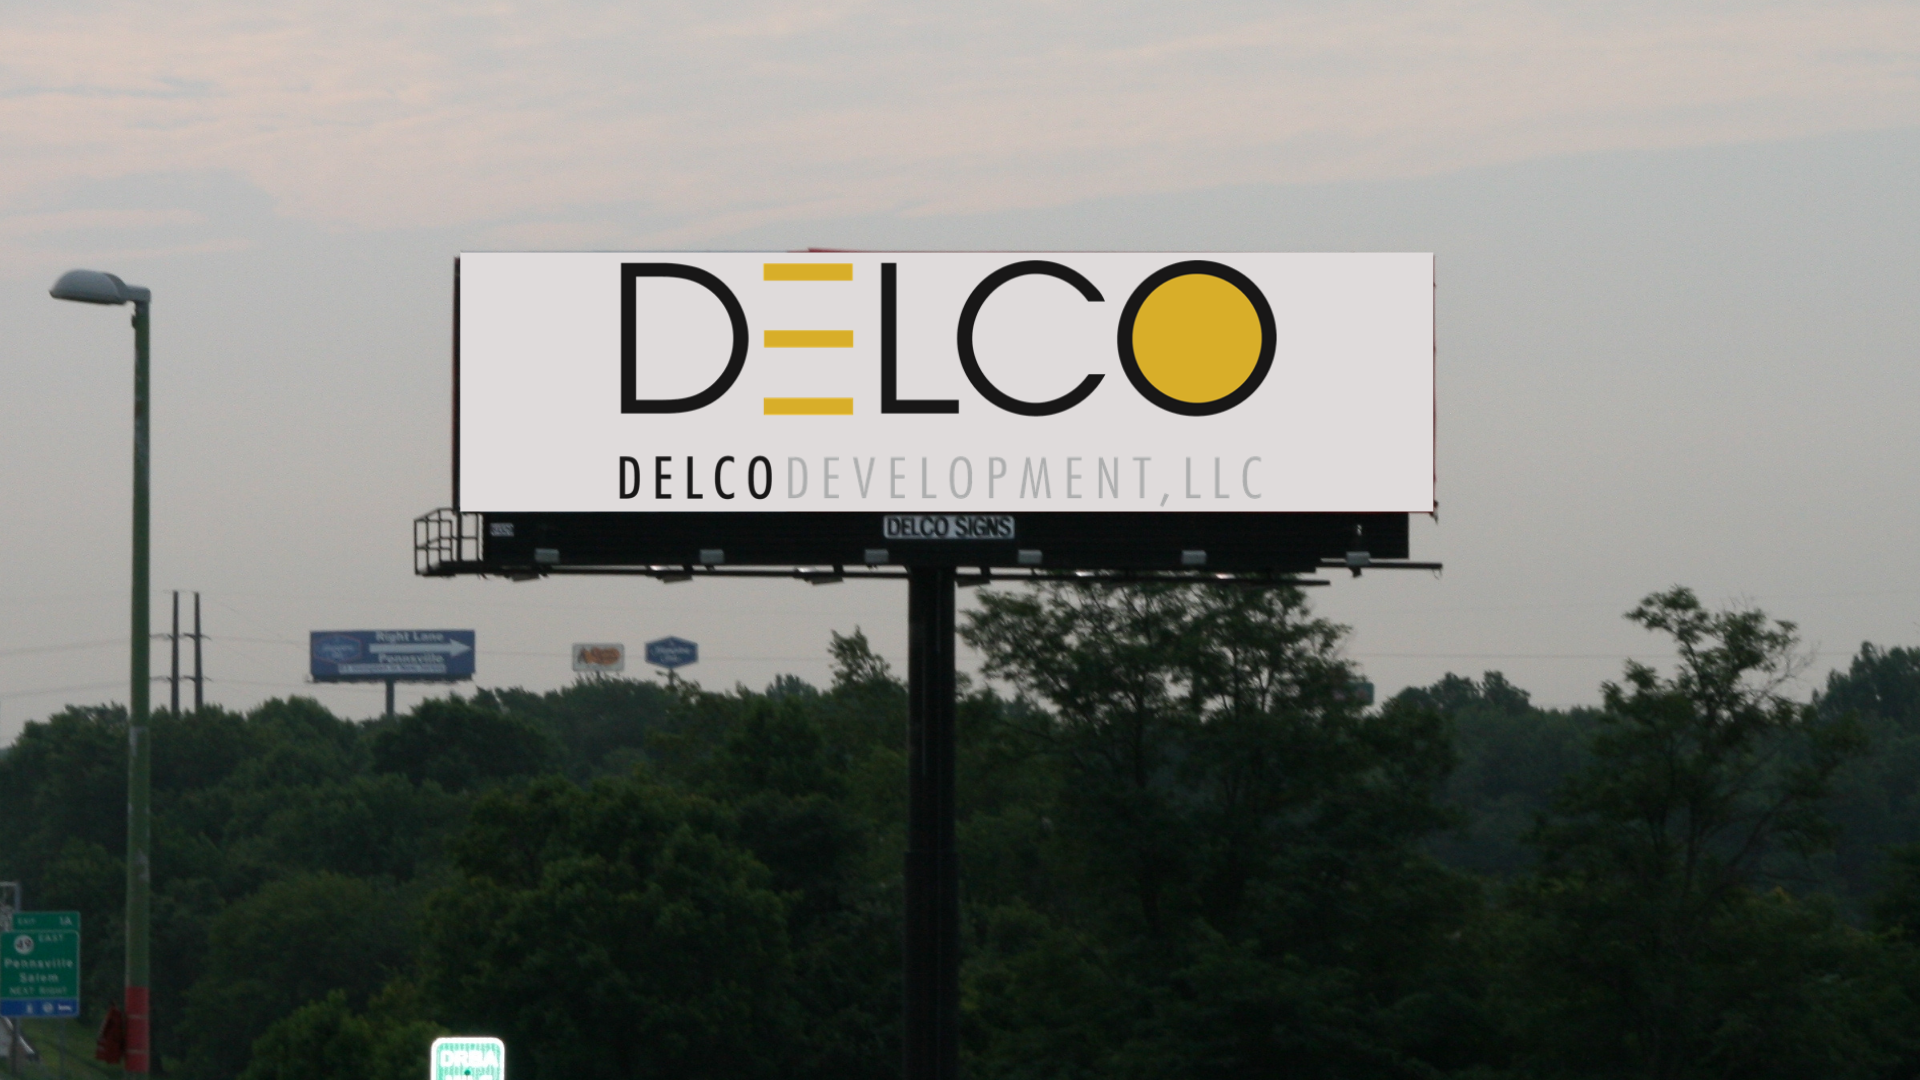 Billboard over trees